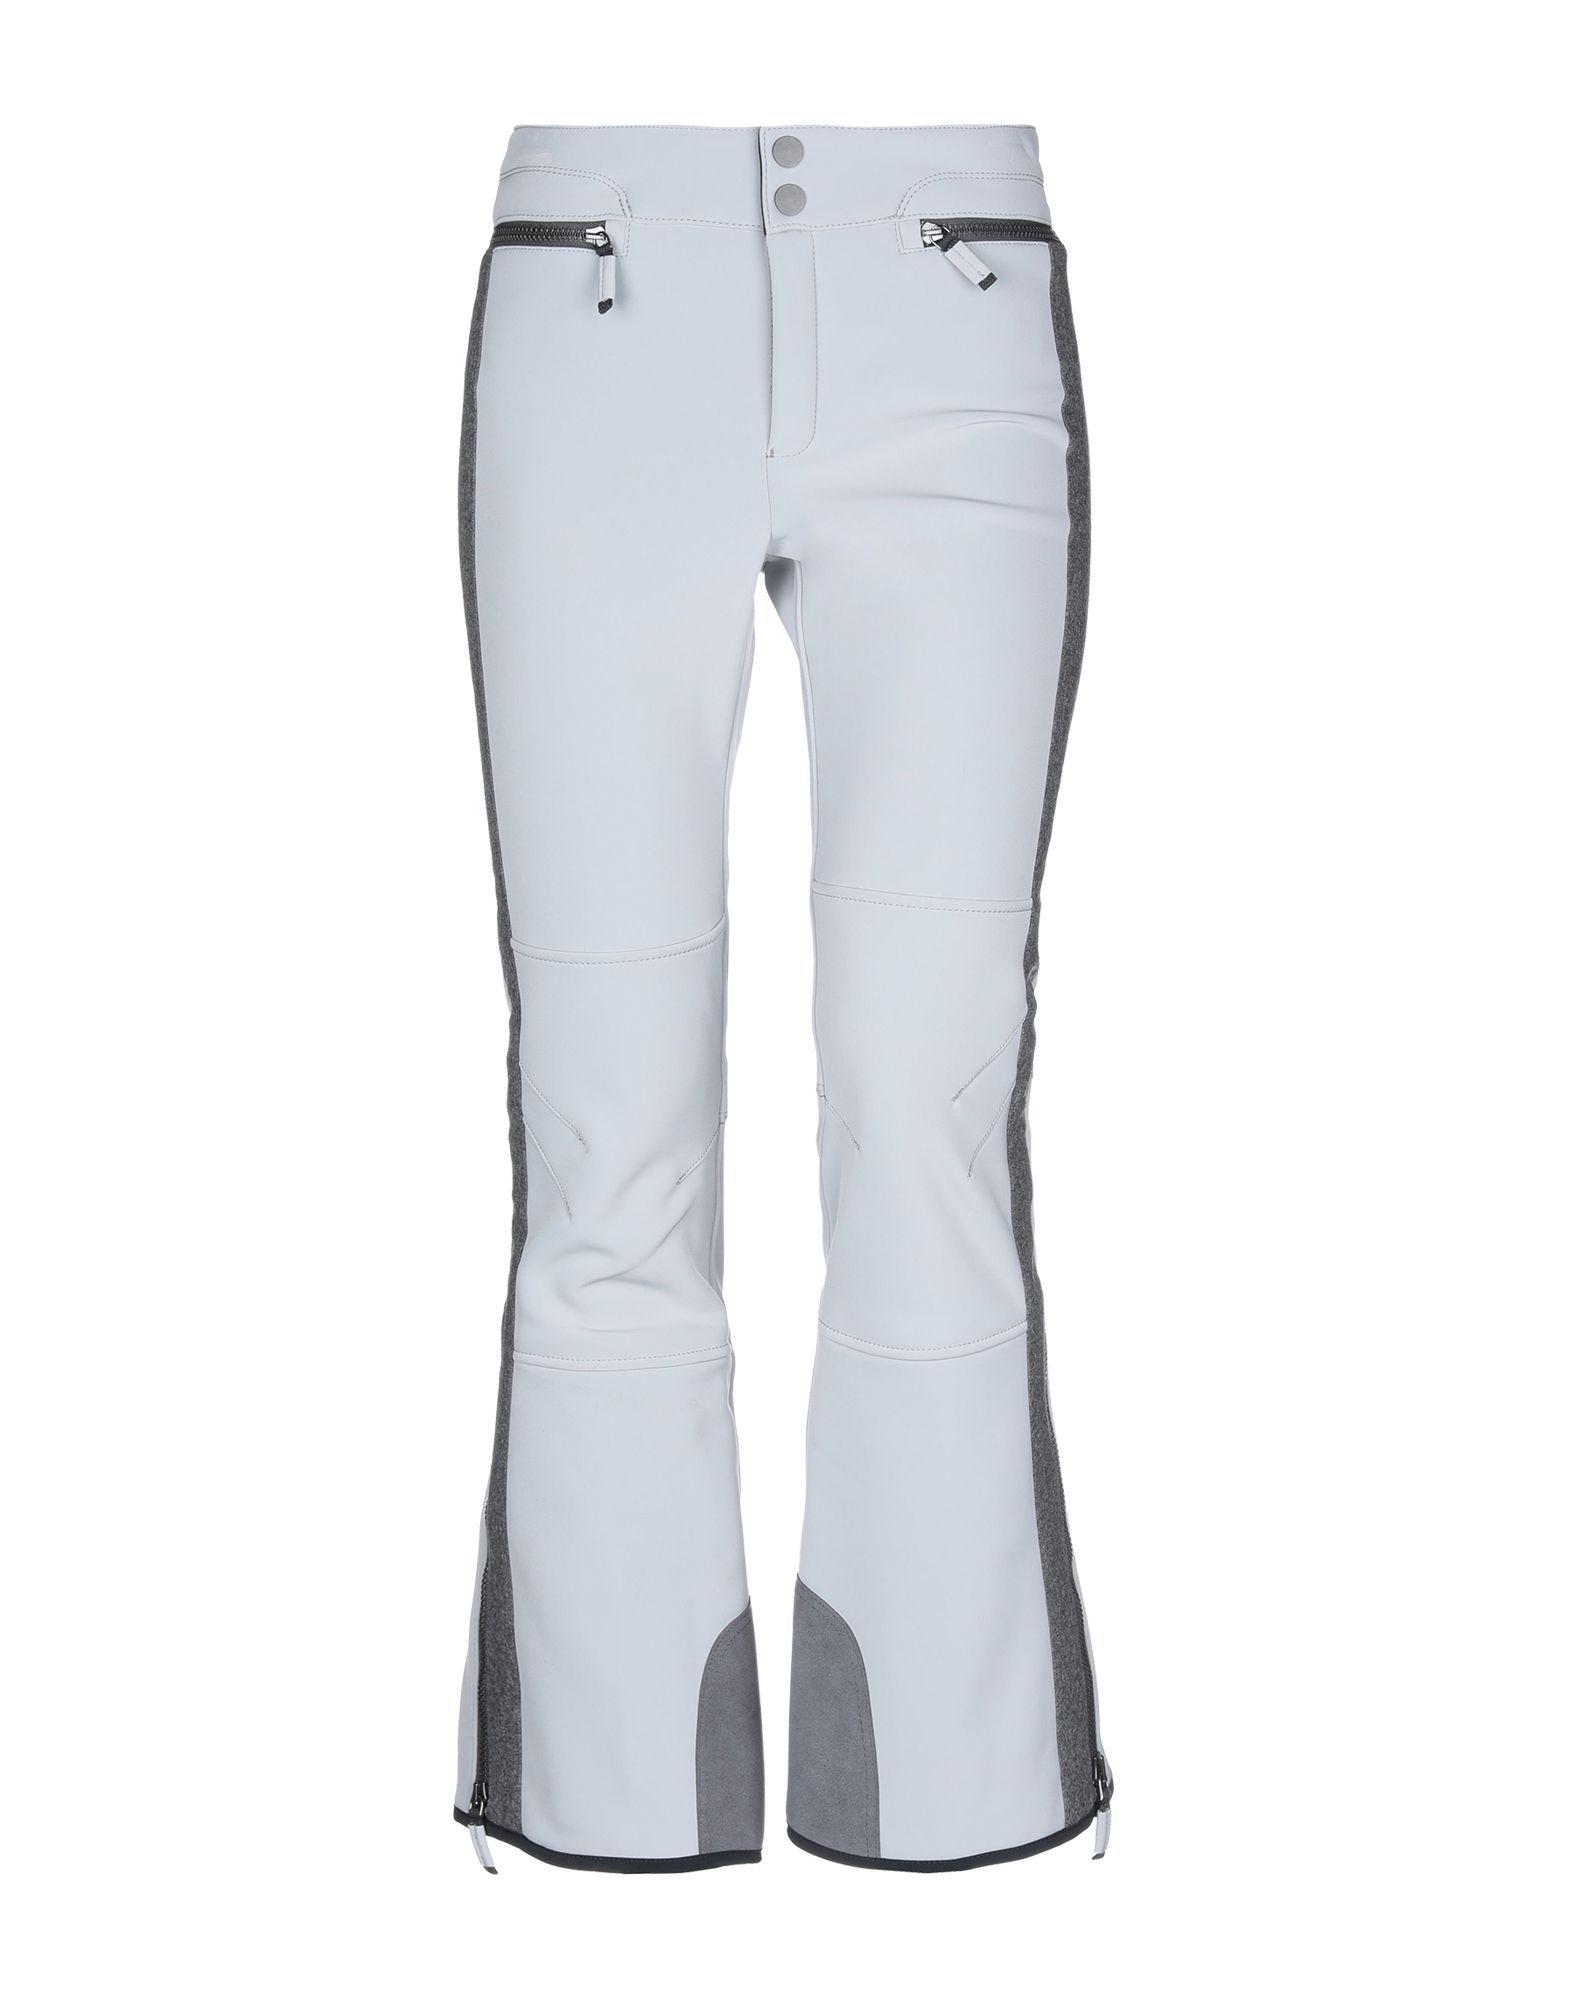 e417d4e1 Flared Pant in Light Grey